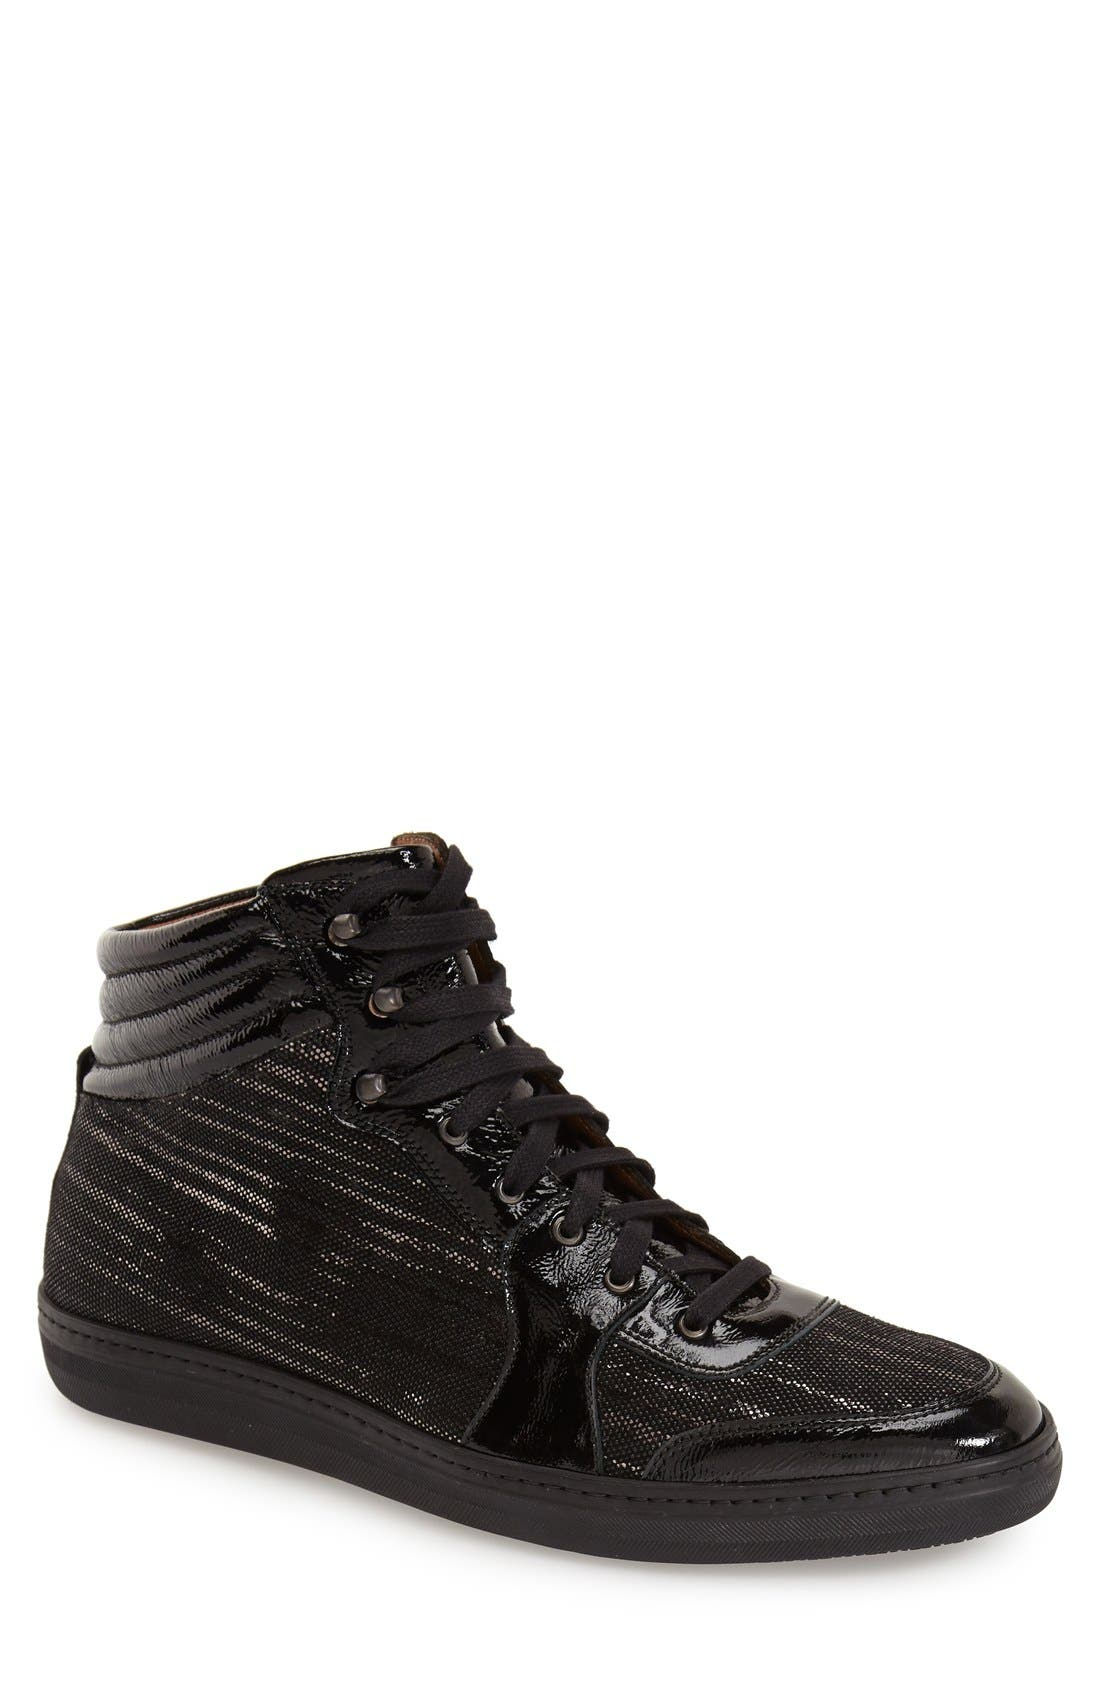 'Bordeau' Sneaker,                         Main,                         color, Black